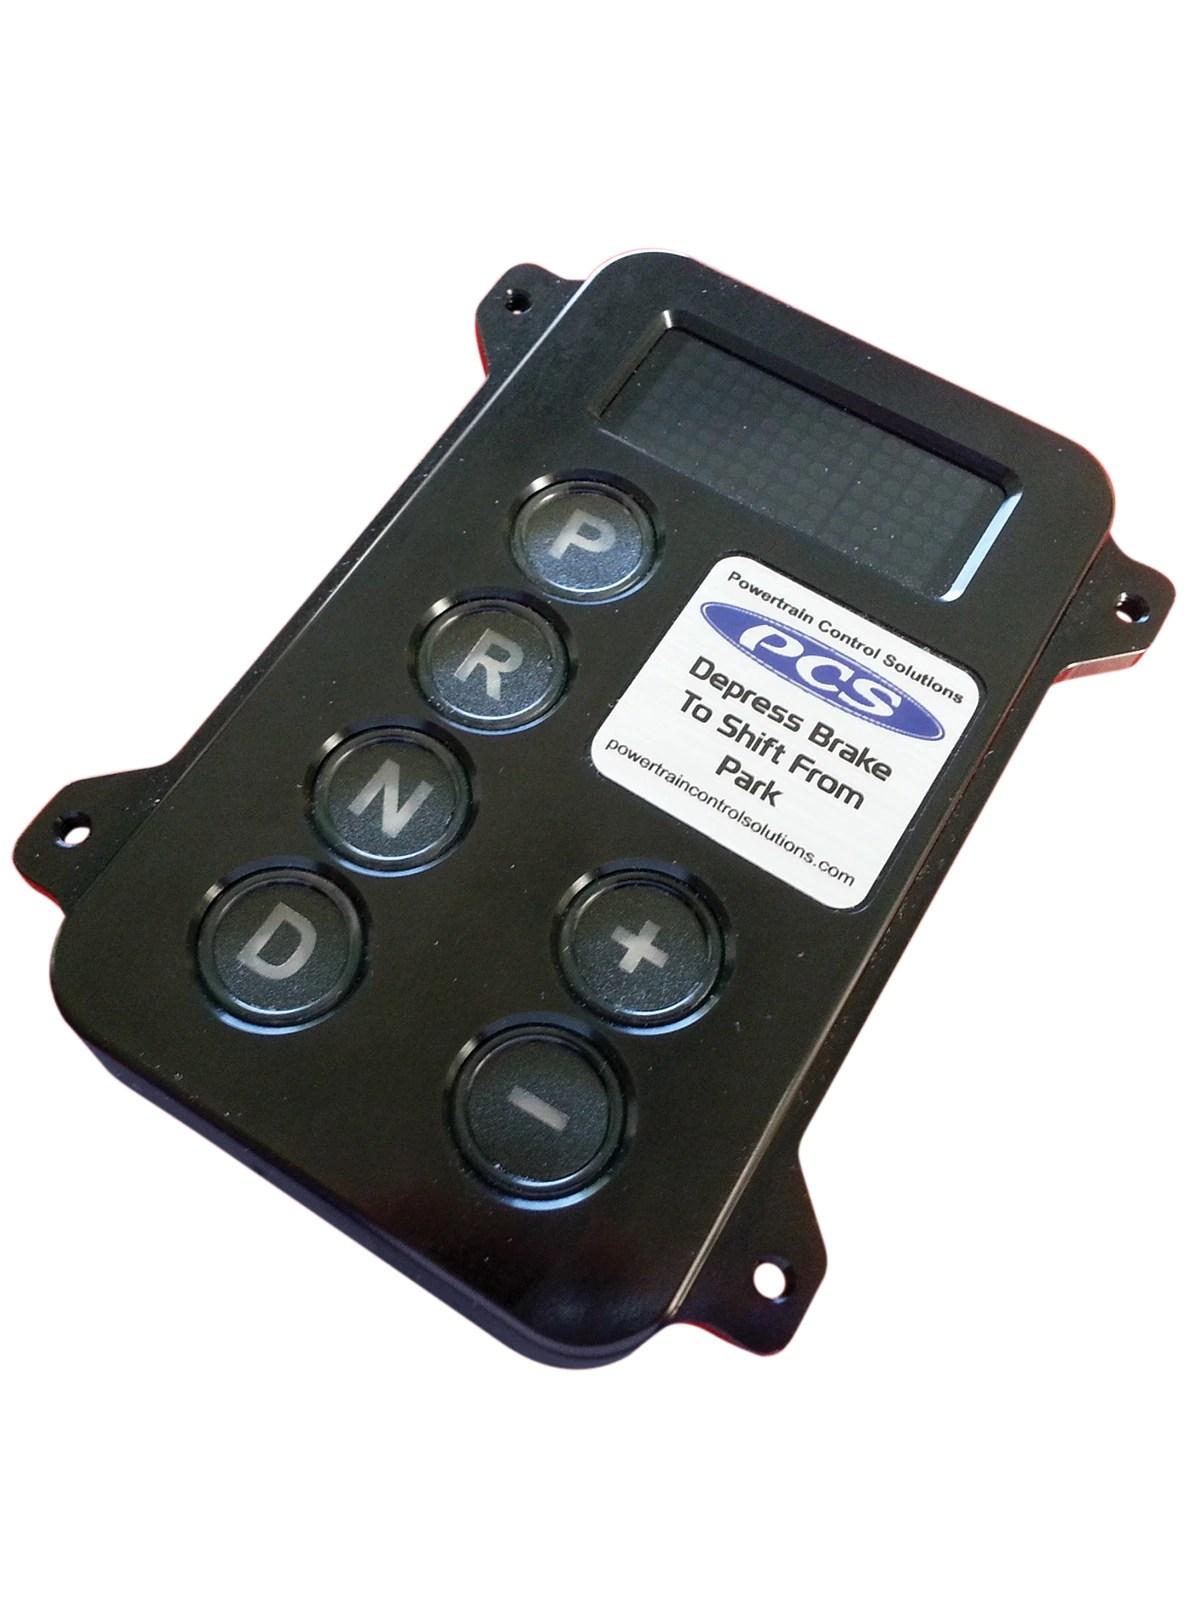 Oxygen Sensor Circuit Http Engine Codescom Articles Oxygen Sensor